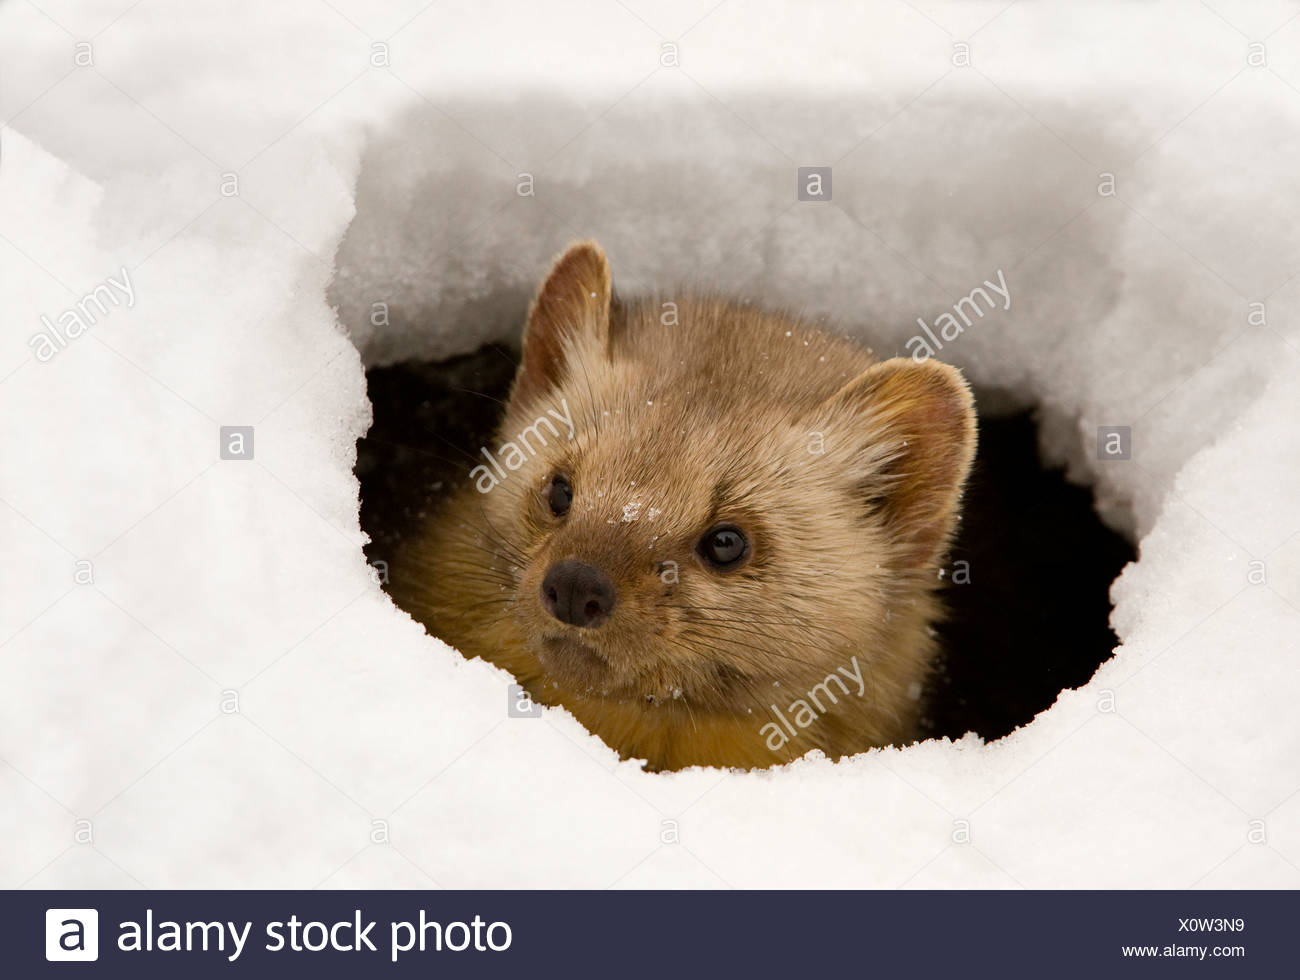 Pine marten (Martens americana) peeking from an ice hole - Stock Image